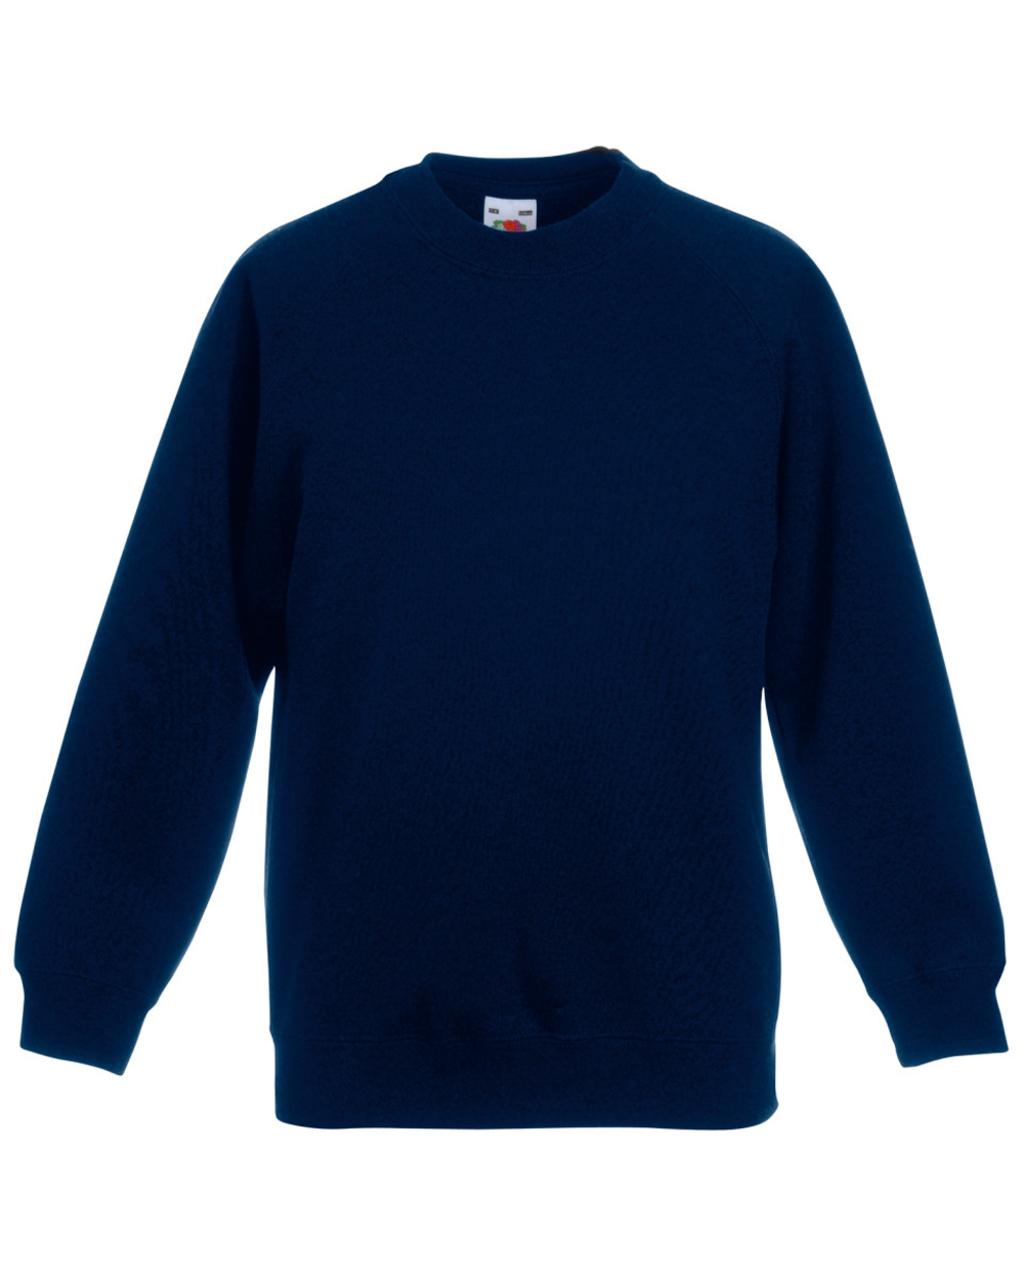 Fruit of the Loom Kids Raglan Sweatshirt Sweater Jumper Plain Top ...